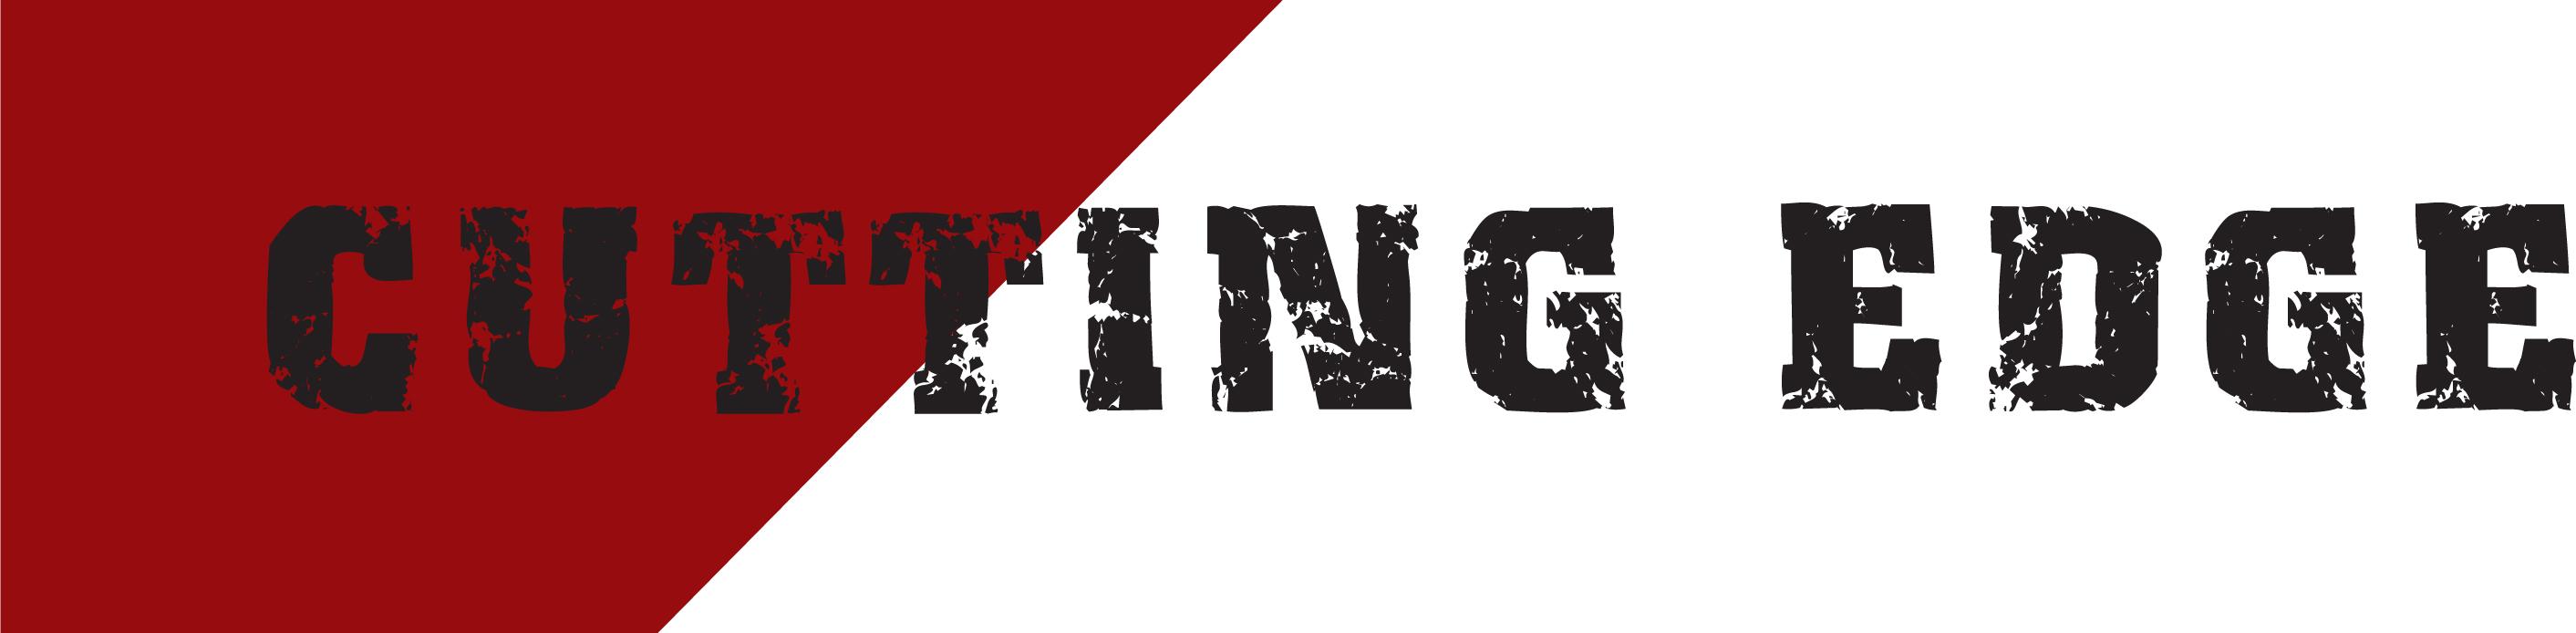 cuttingedge-logo.jpg